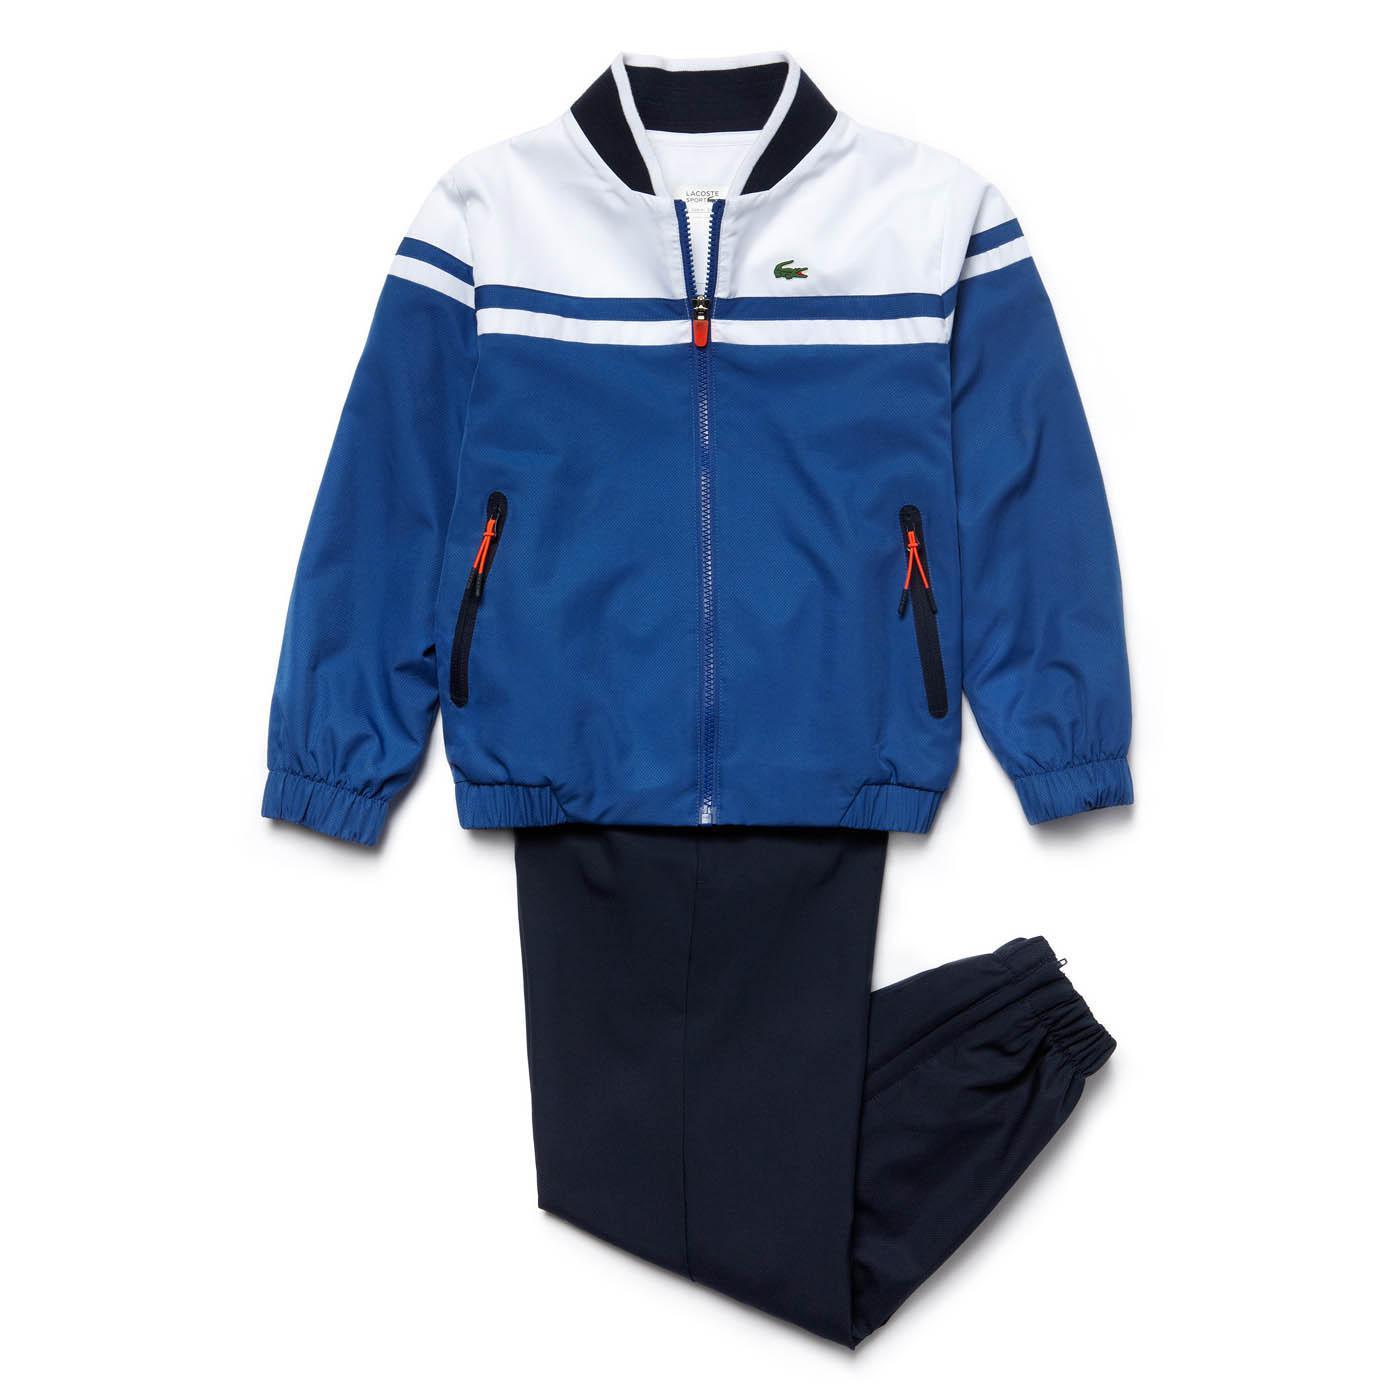 7b21fa96d Lacoste Sport Boys Tracksuit - Blue/White/Navy - Tennisnuts.com